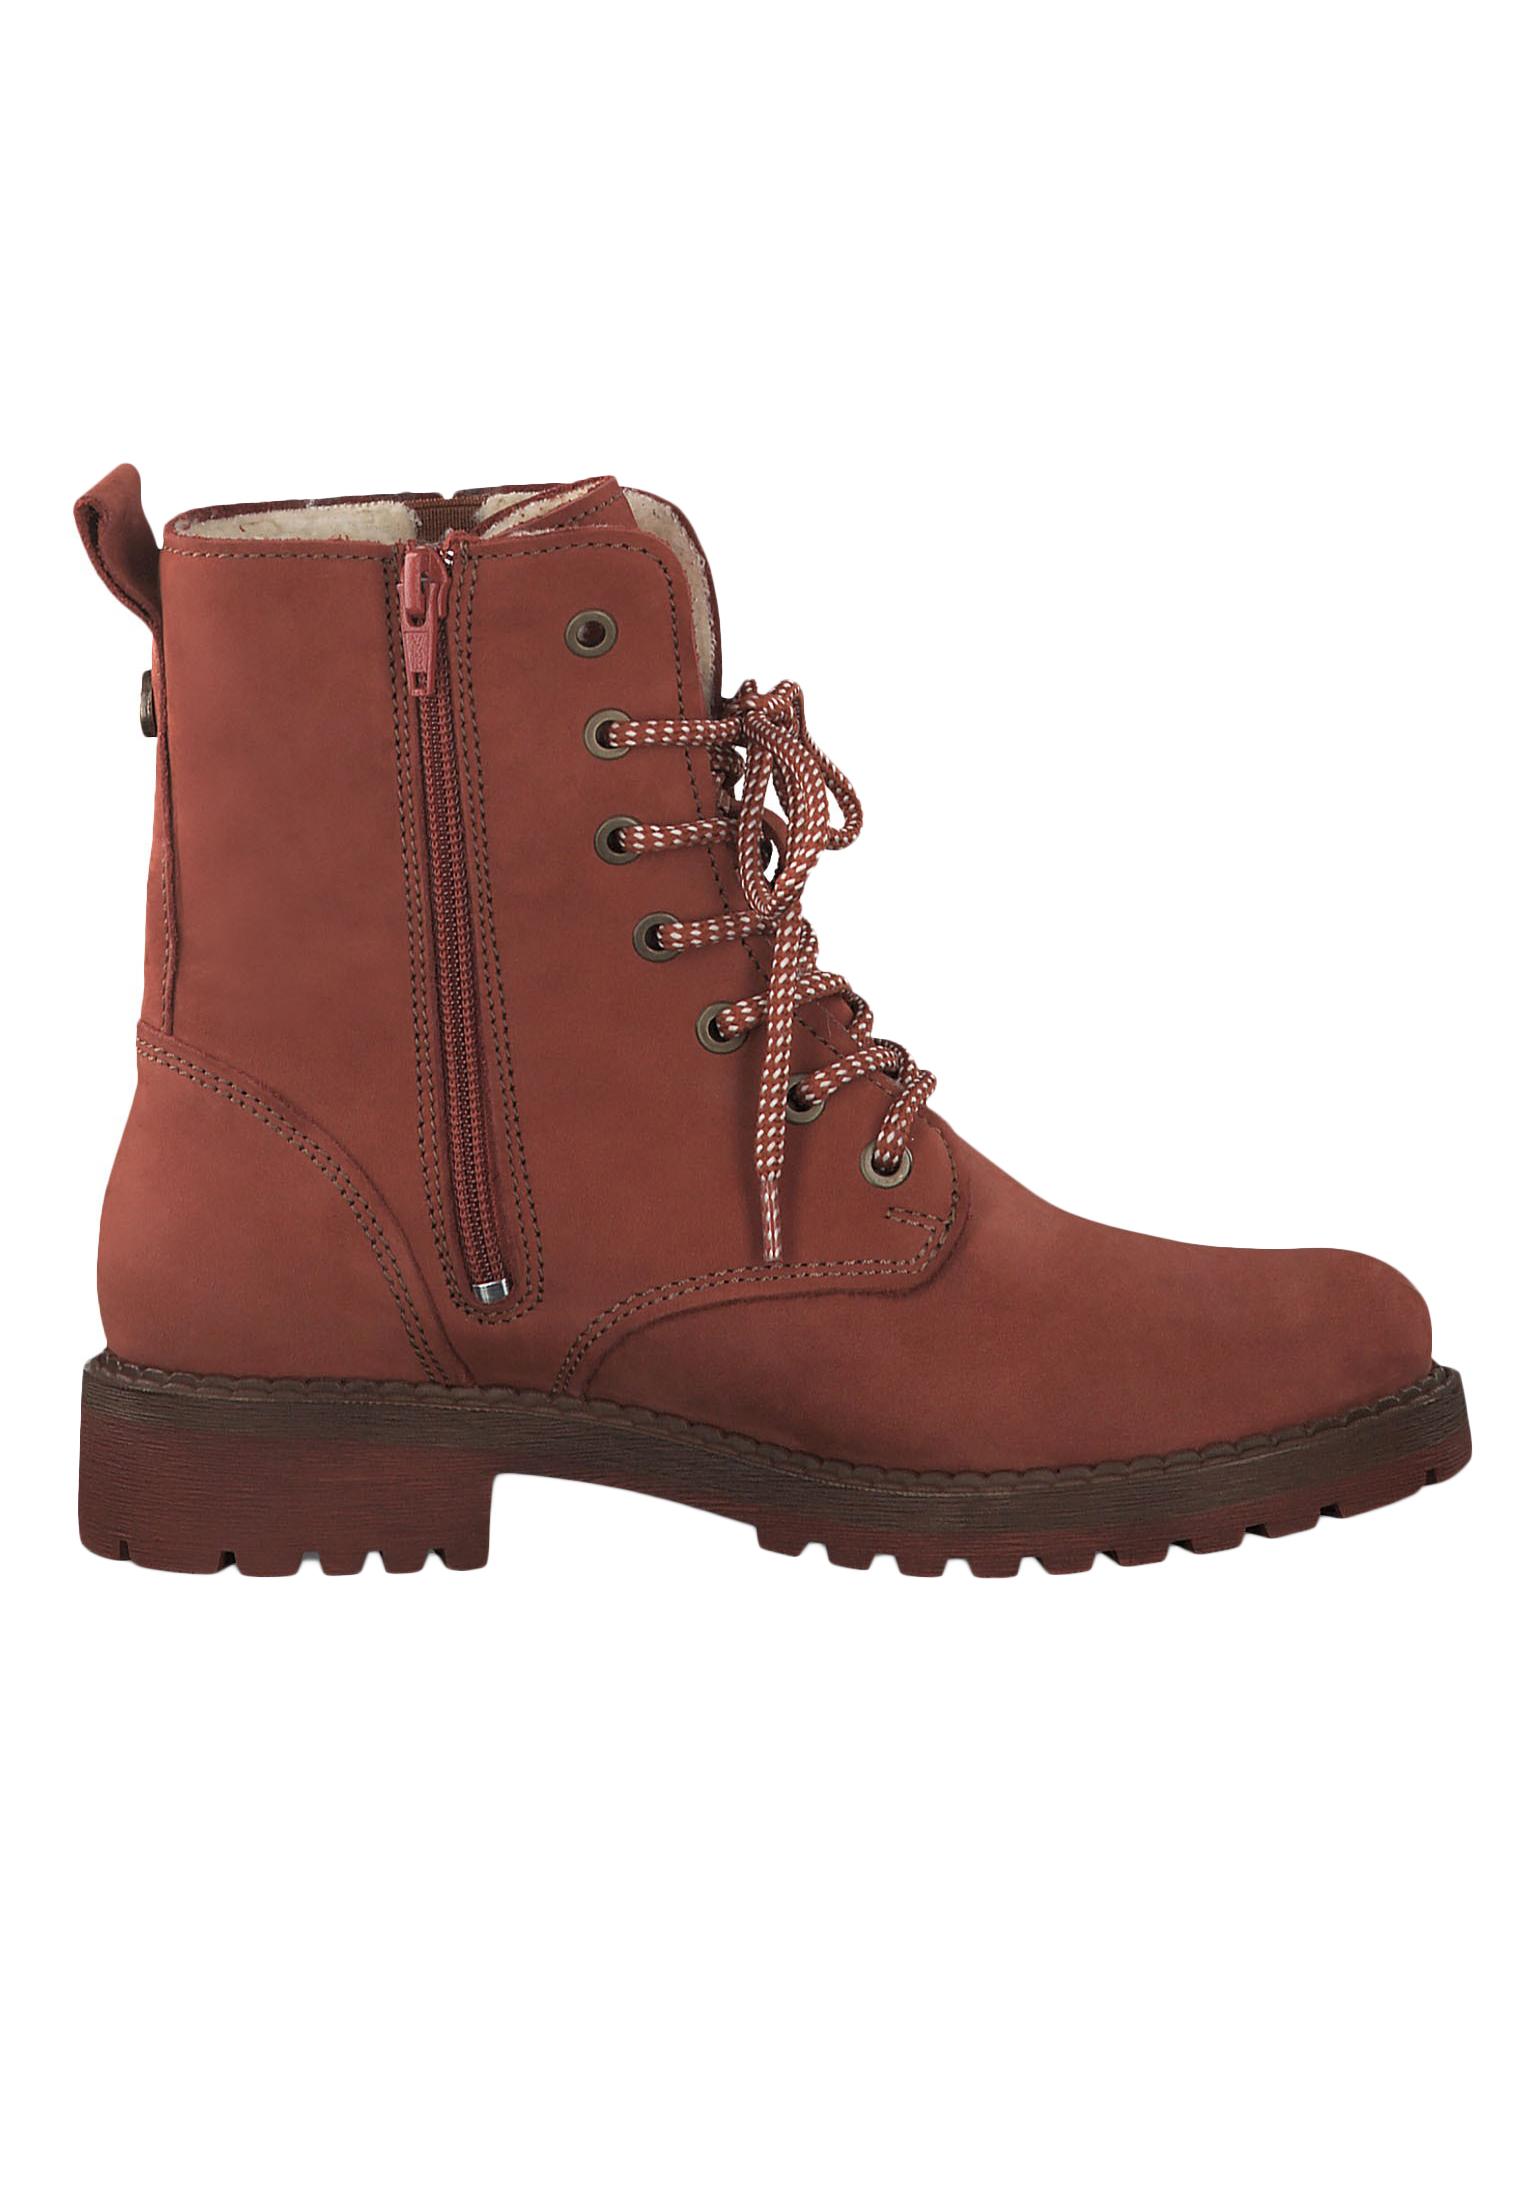 Tamaris 1 26267 23 540 Damen Stiefelette Lace Up Boots Leder Brick Rot mit Warmfutter